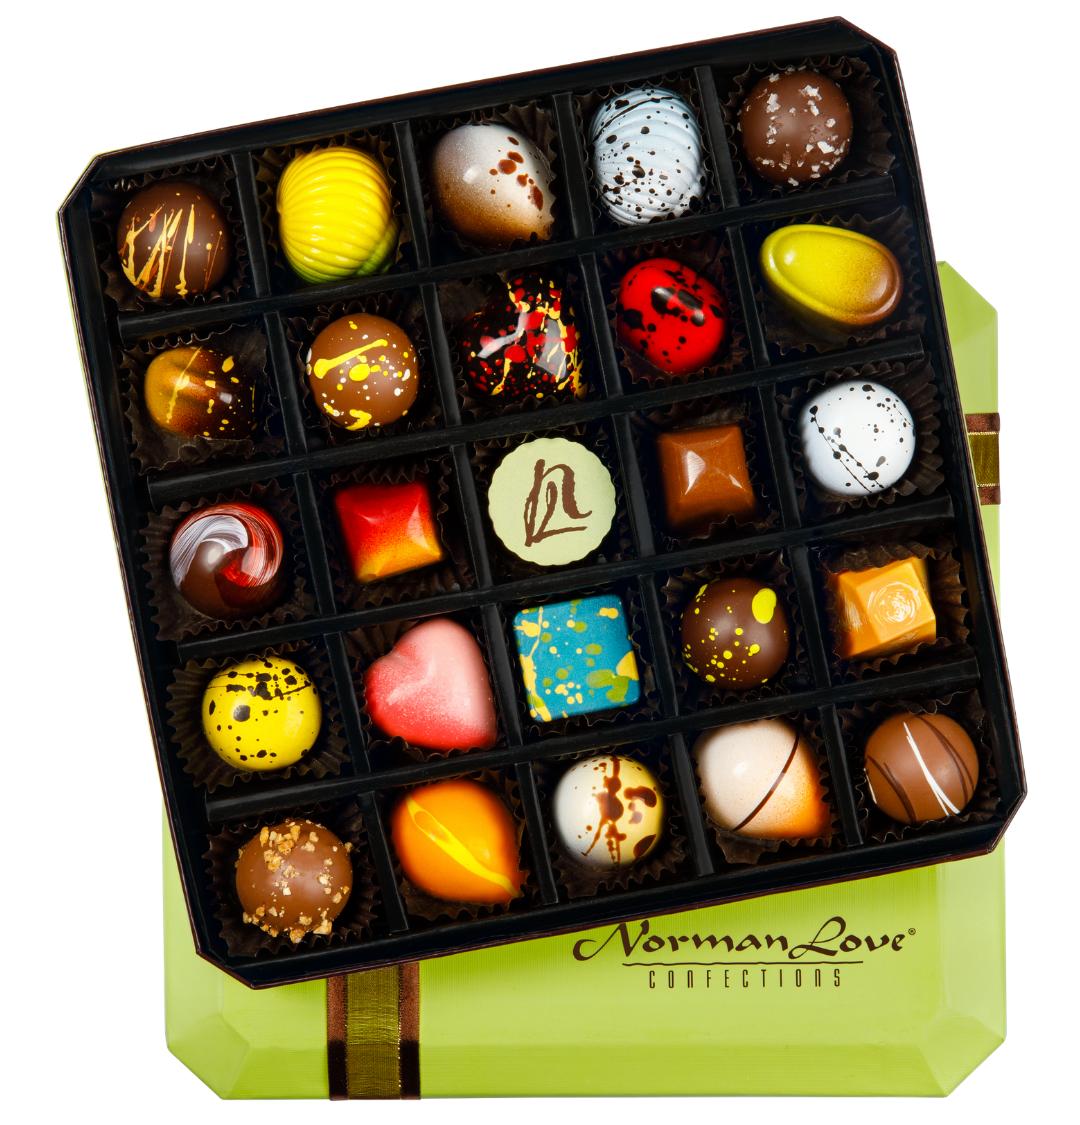 Colorful box of chocolates